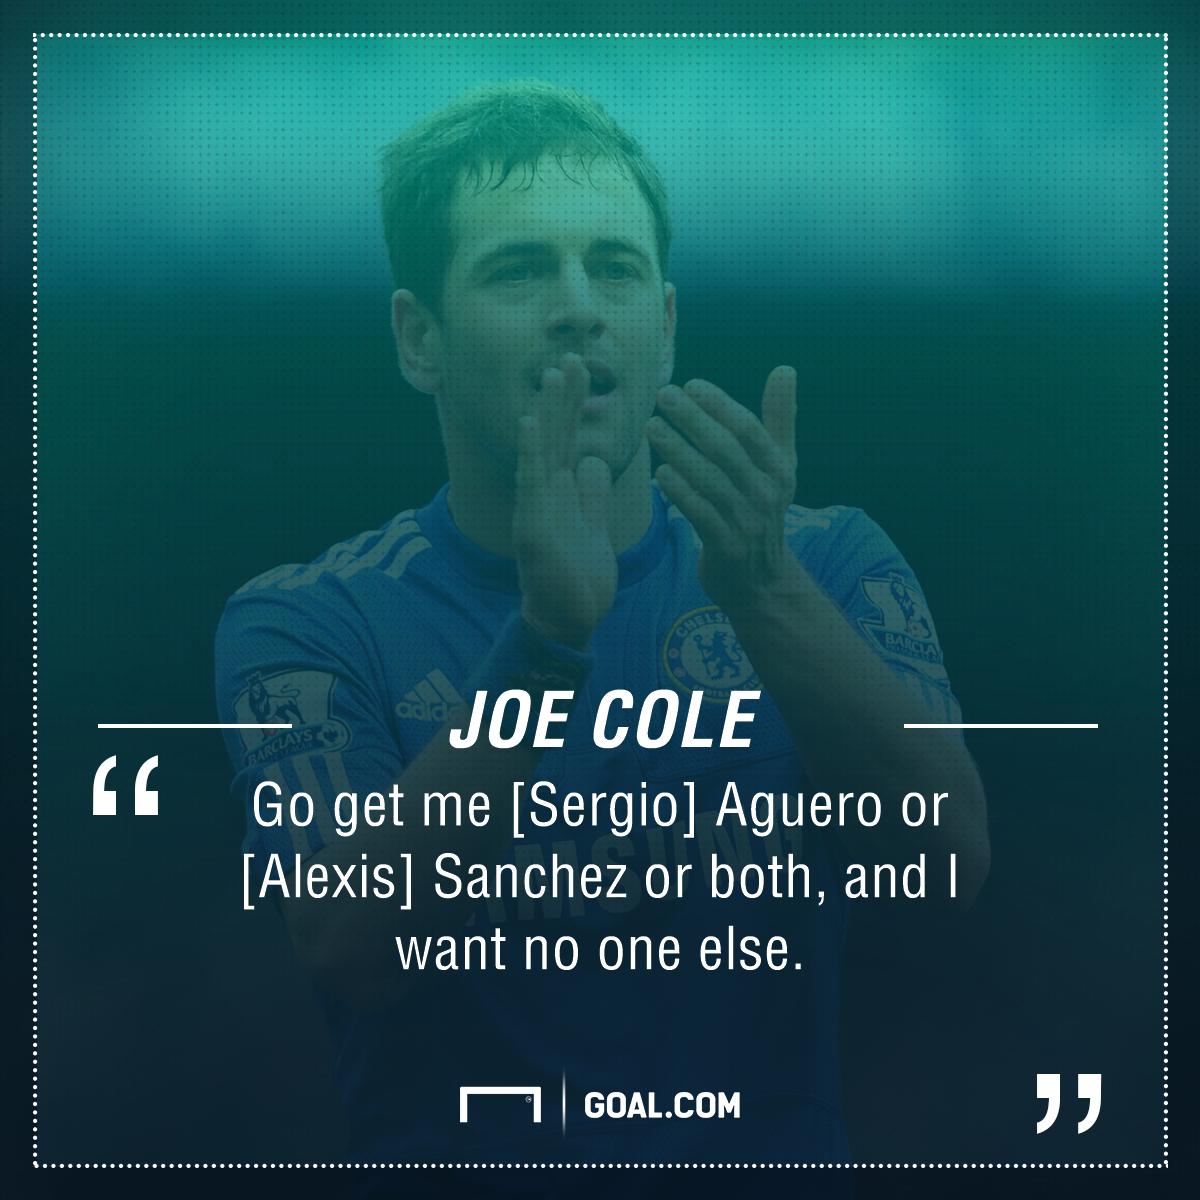 Joe Cole quote